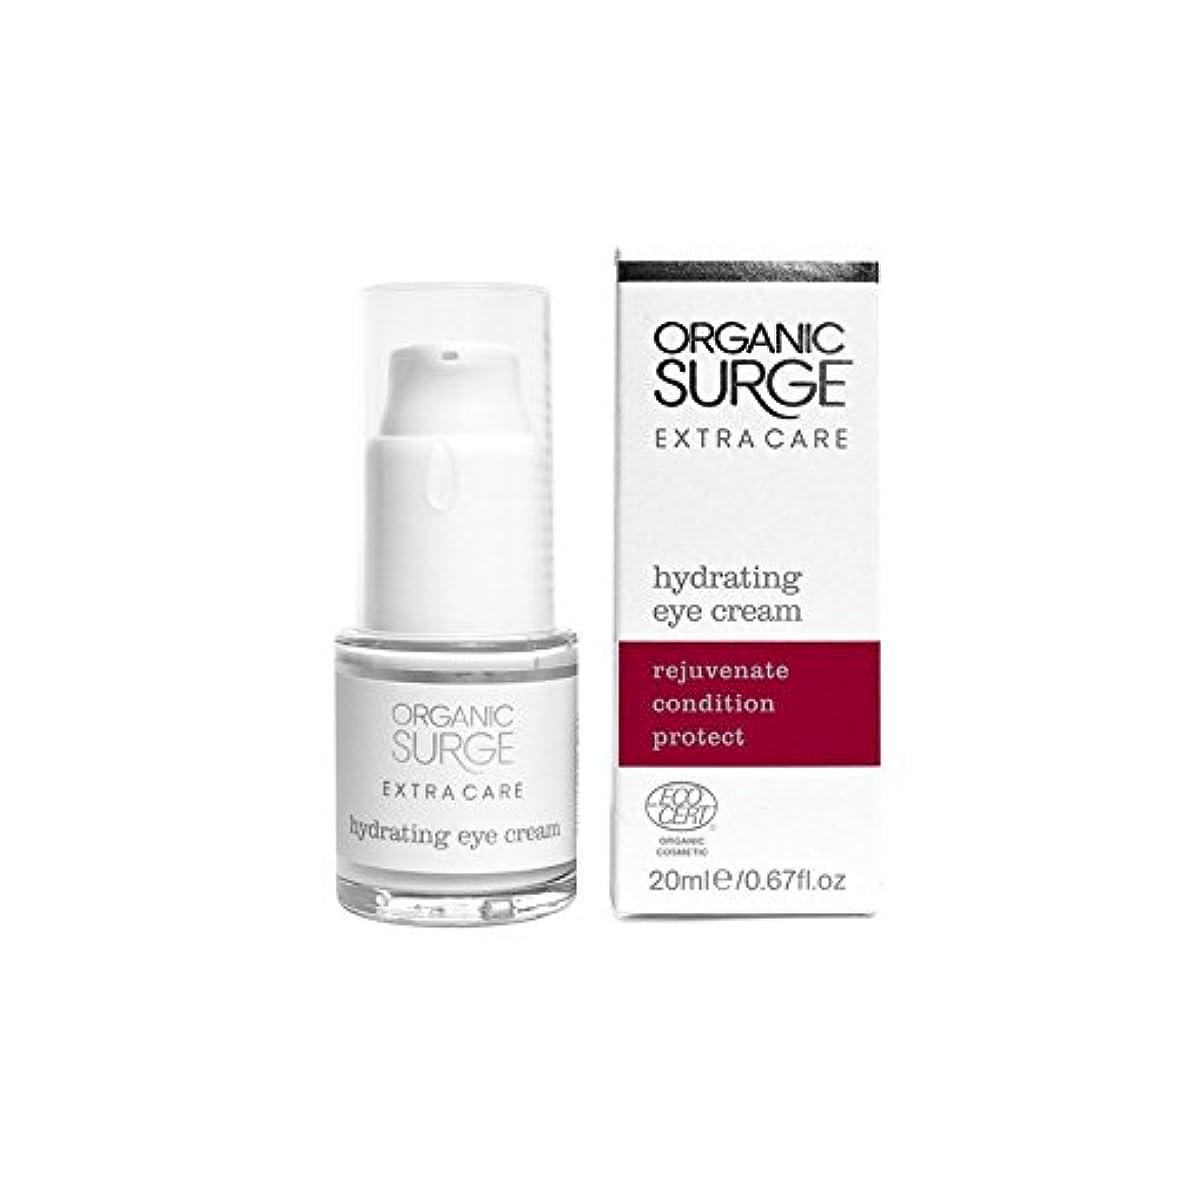 Organic Surge Extra Care Hydrating Eye Cream (20ml) - 有機サージエクストラケア水和アイクリーム(20ミリリットル) [並行輸入品]